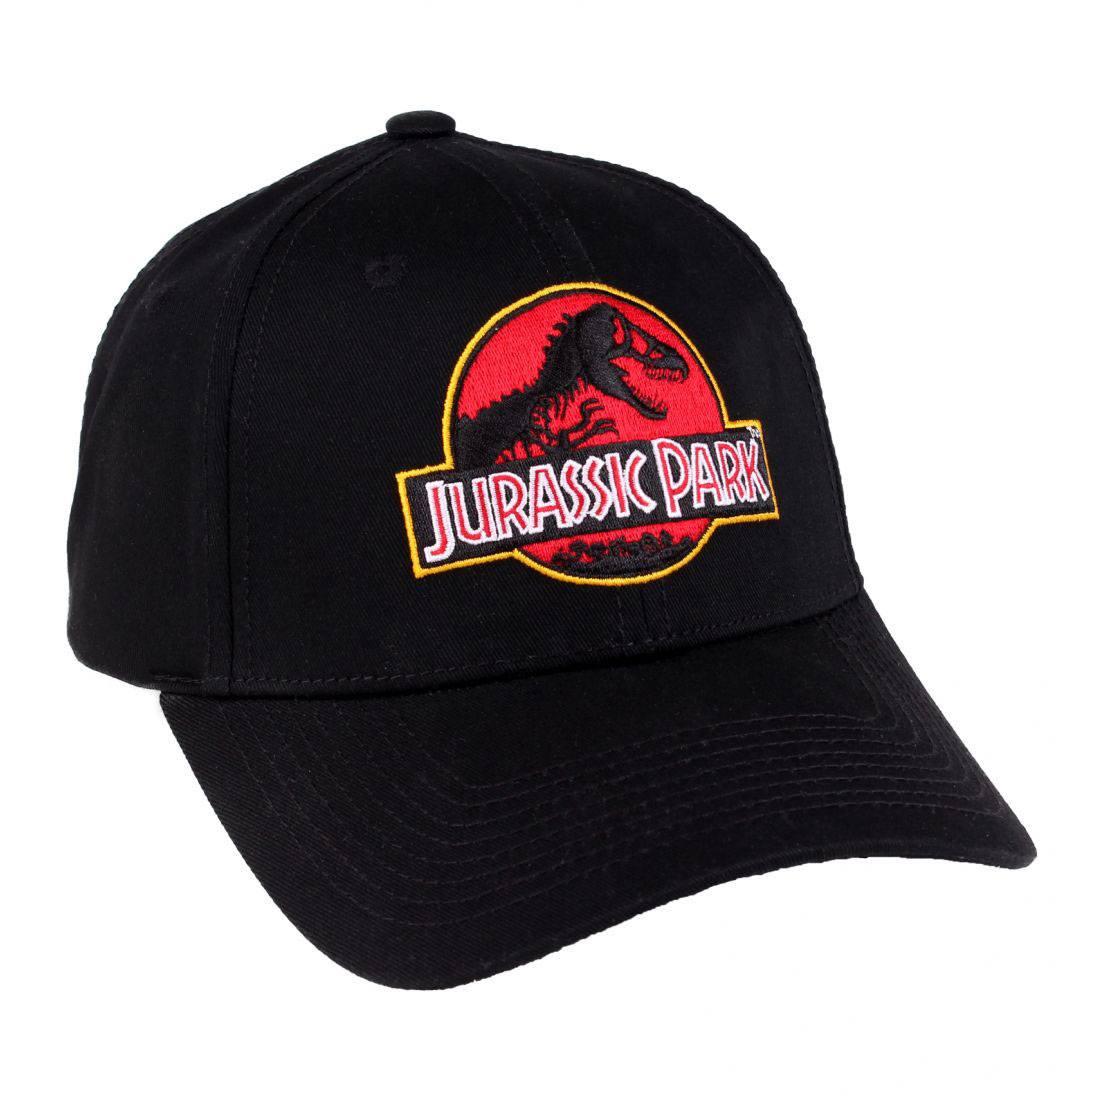 Jurassic Park Baseball Cap Logo